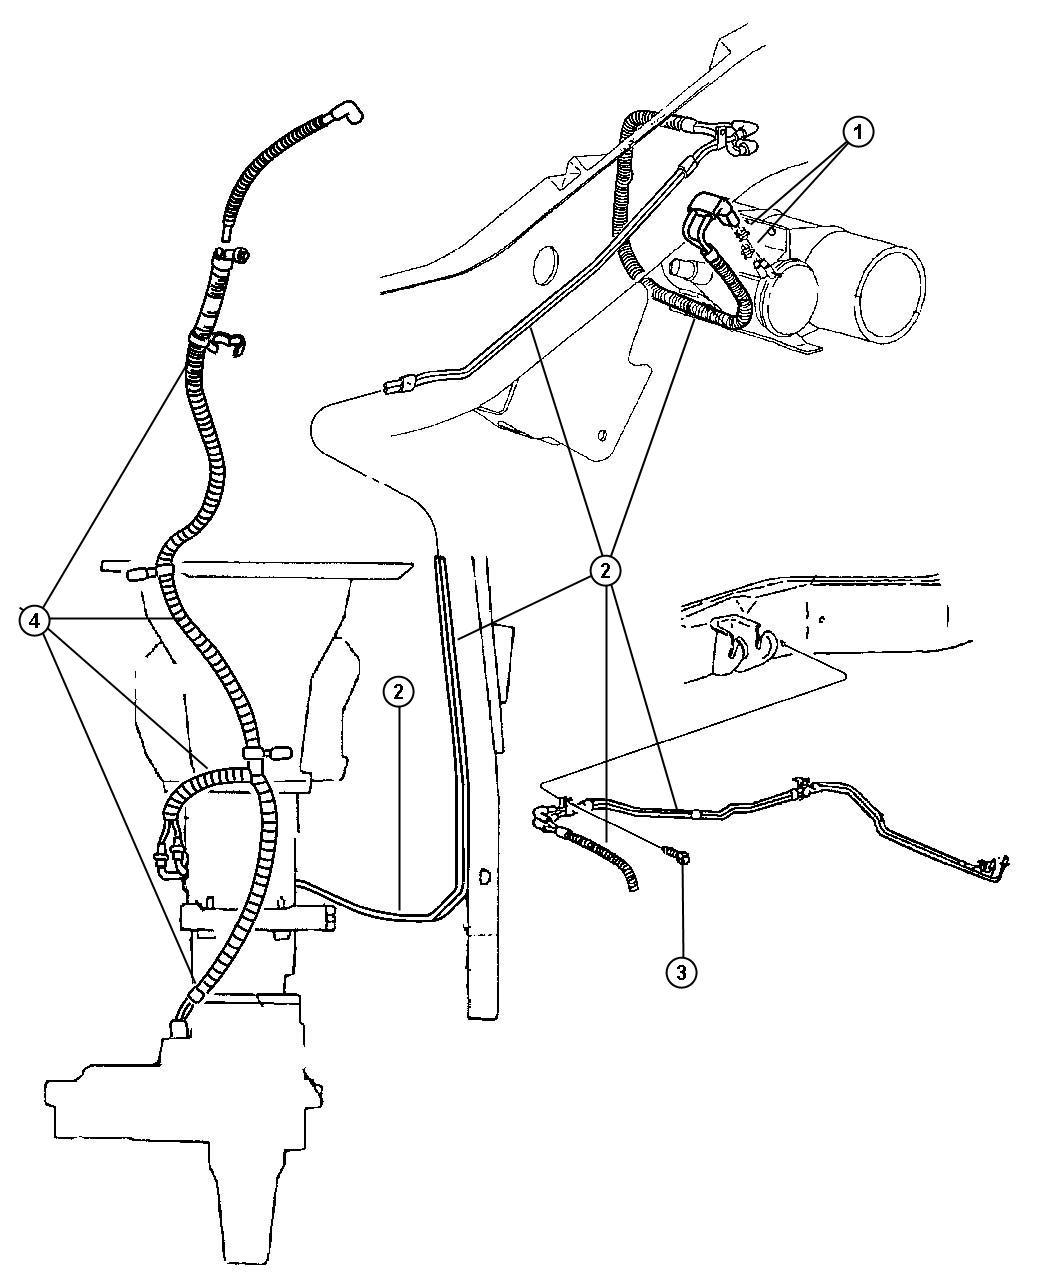 Parts Diagram For 1997 Dodge Ram 2500 4x4, Parts, Free